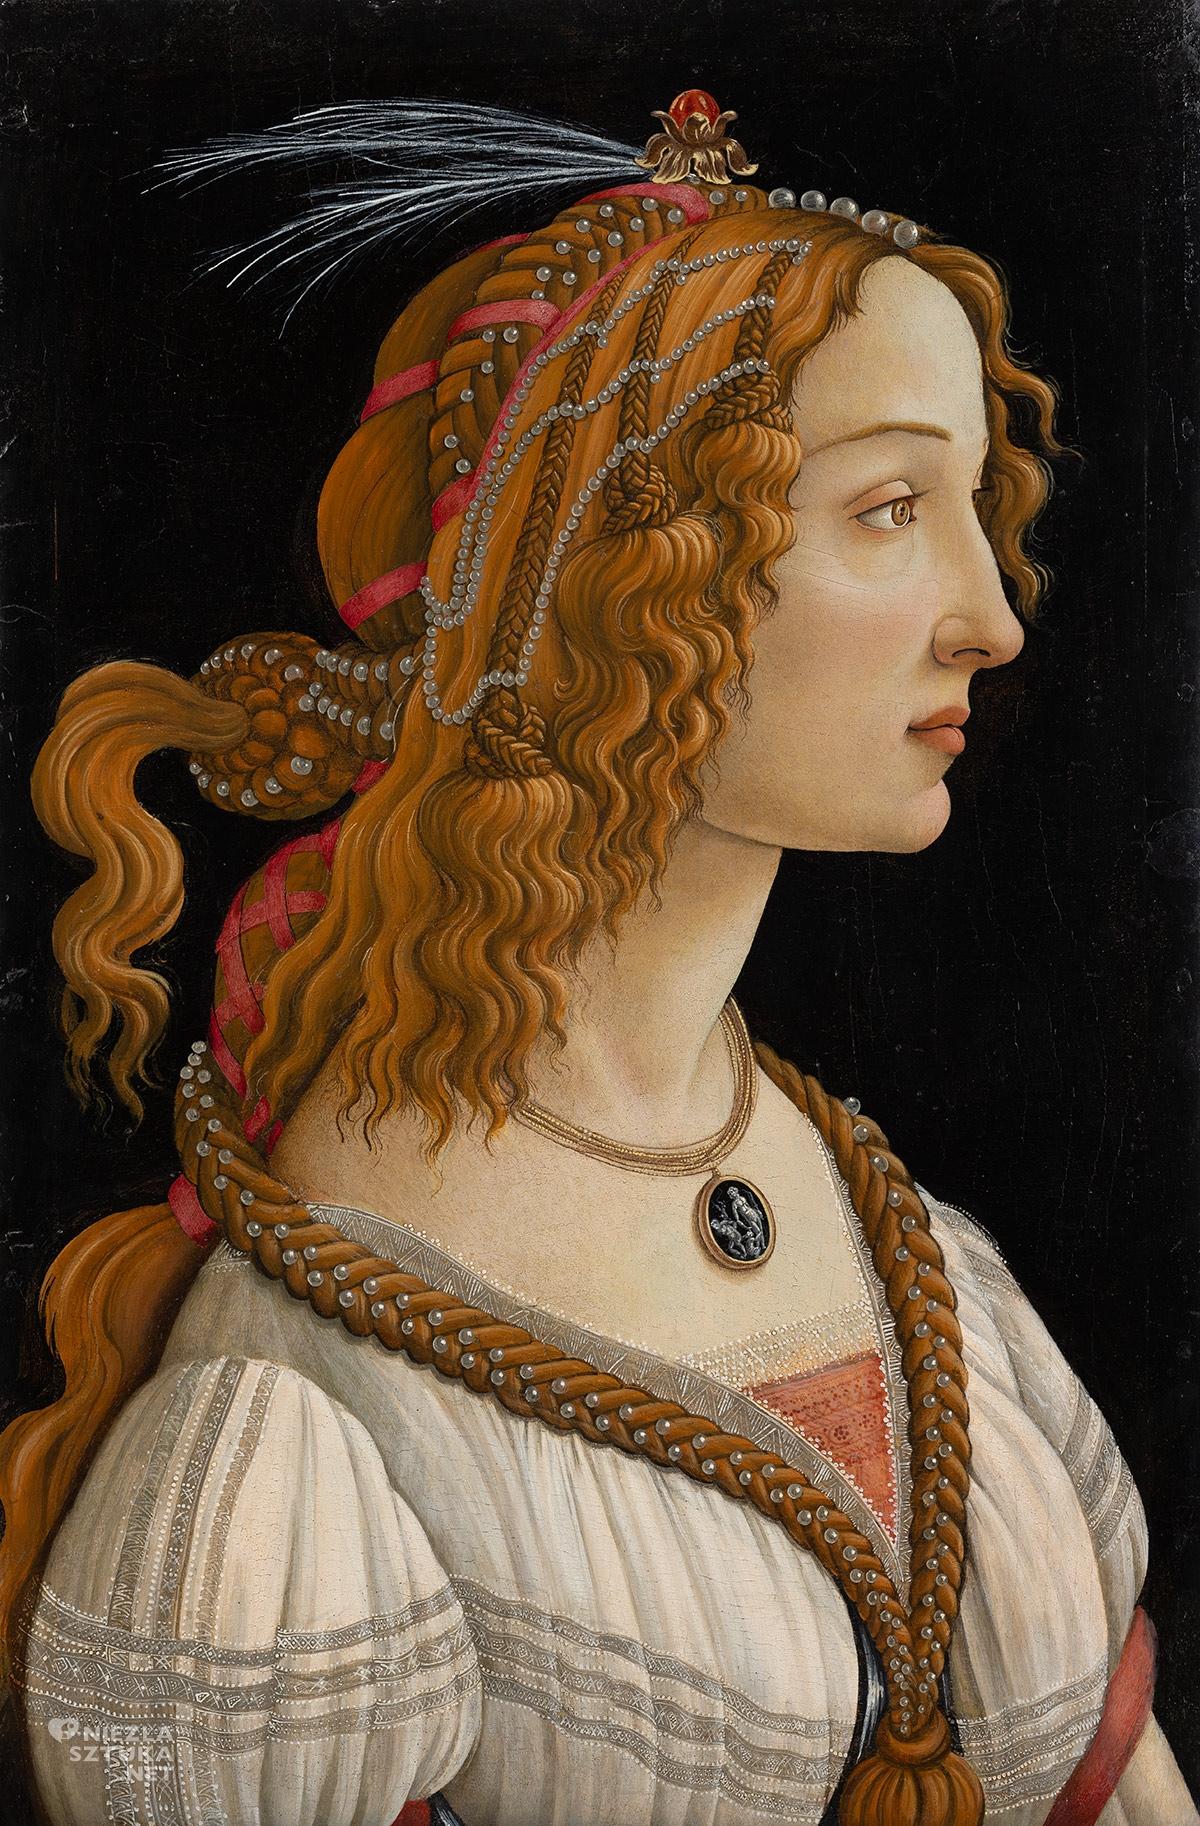 Sandro Botticelli, Simonetta Vespucci, malarstwo włoskie, niezła sztuka